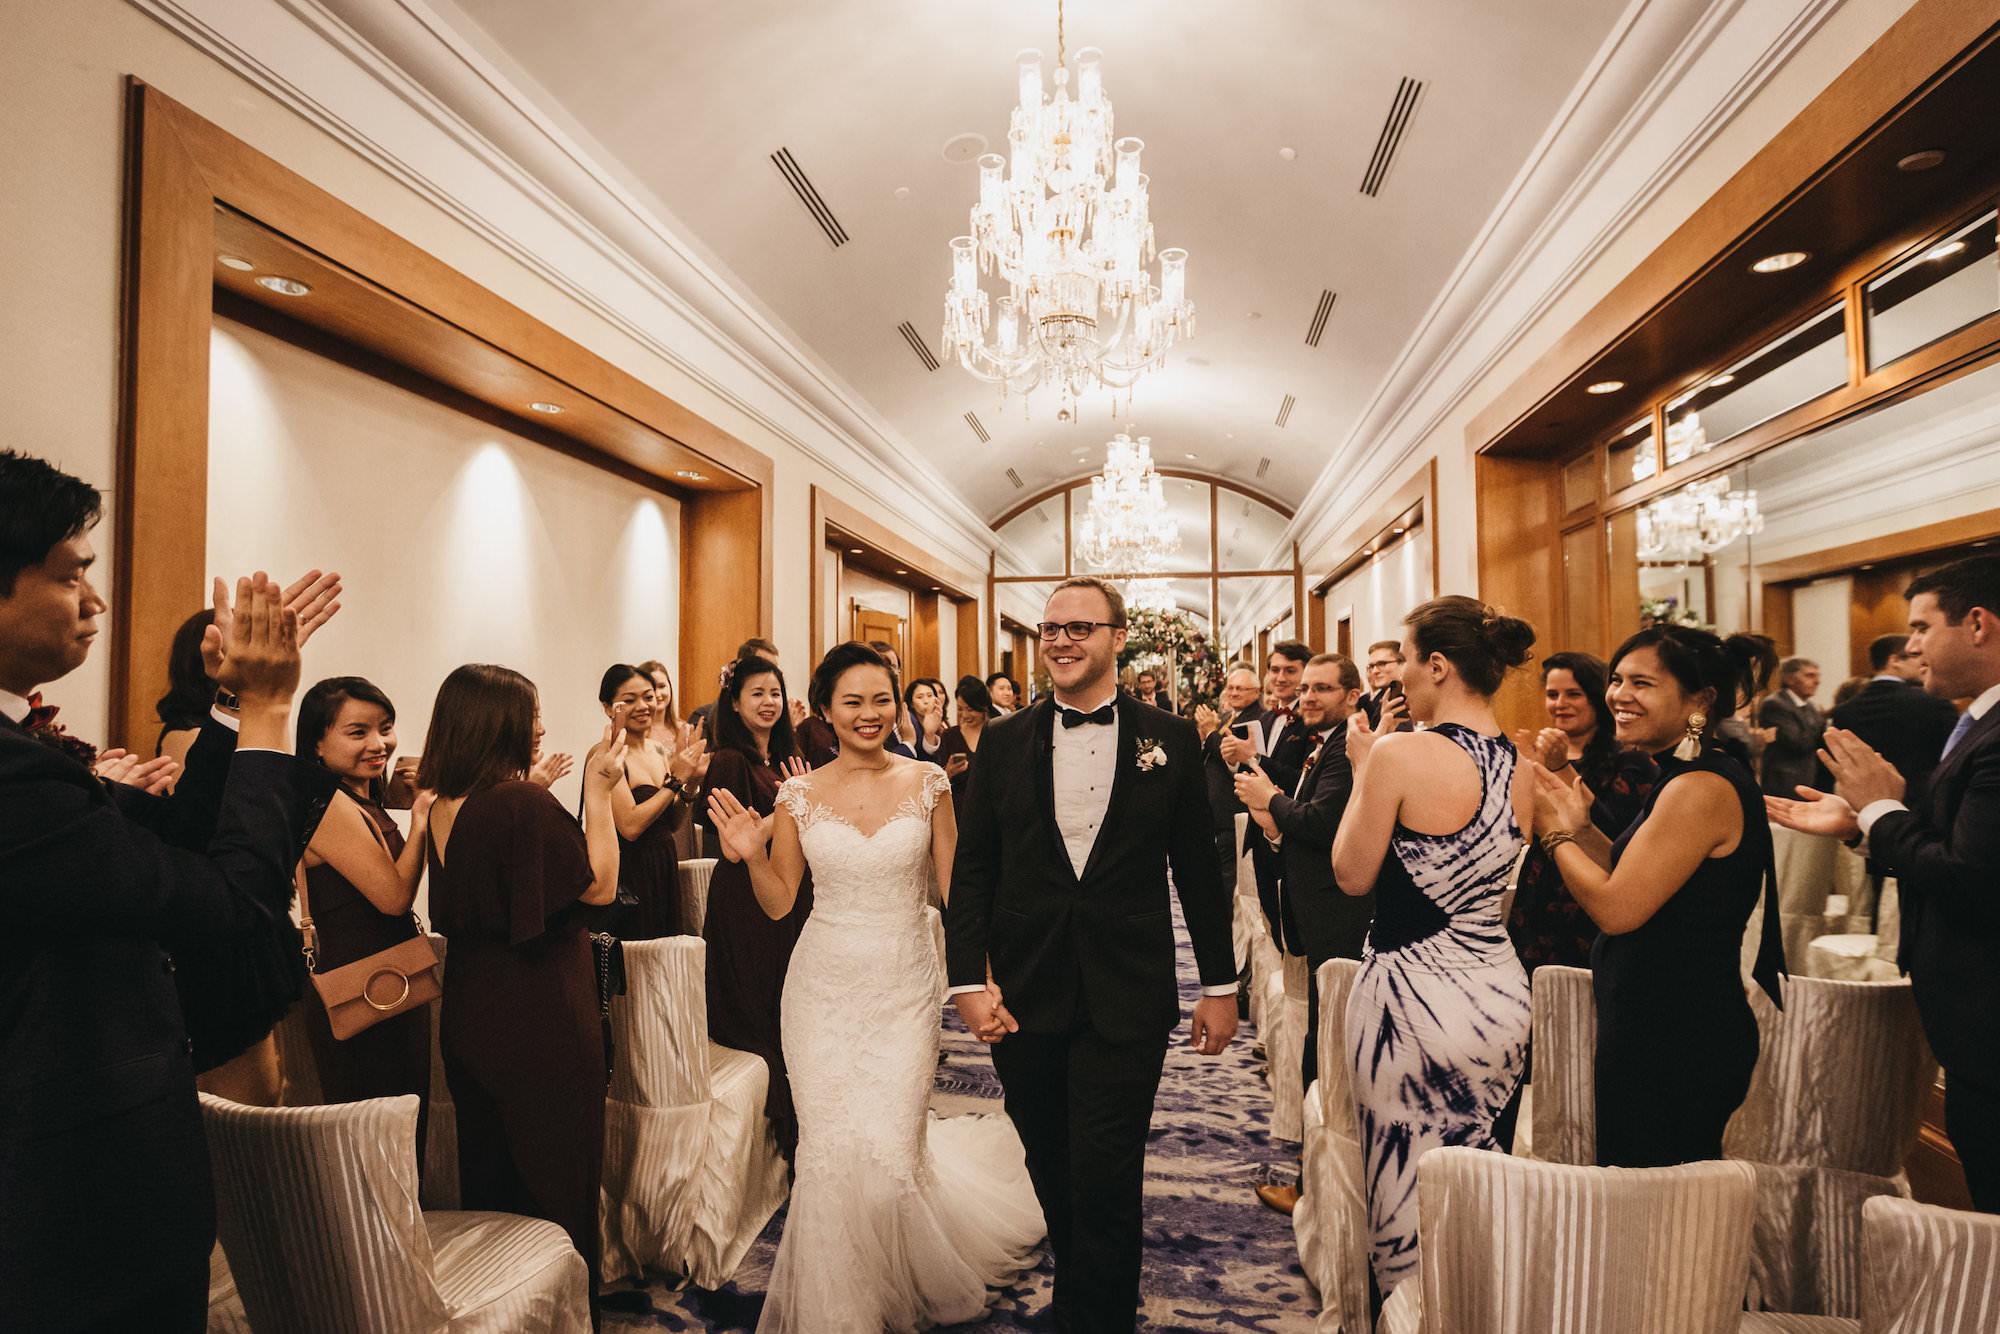 Sui & Nic - Singapore Wedding Photography 36.jpg